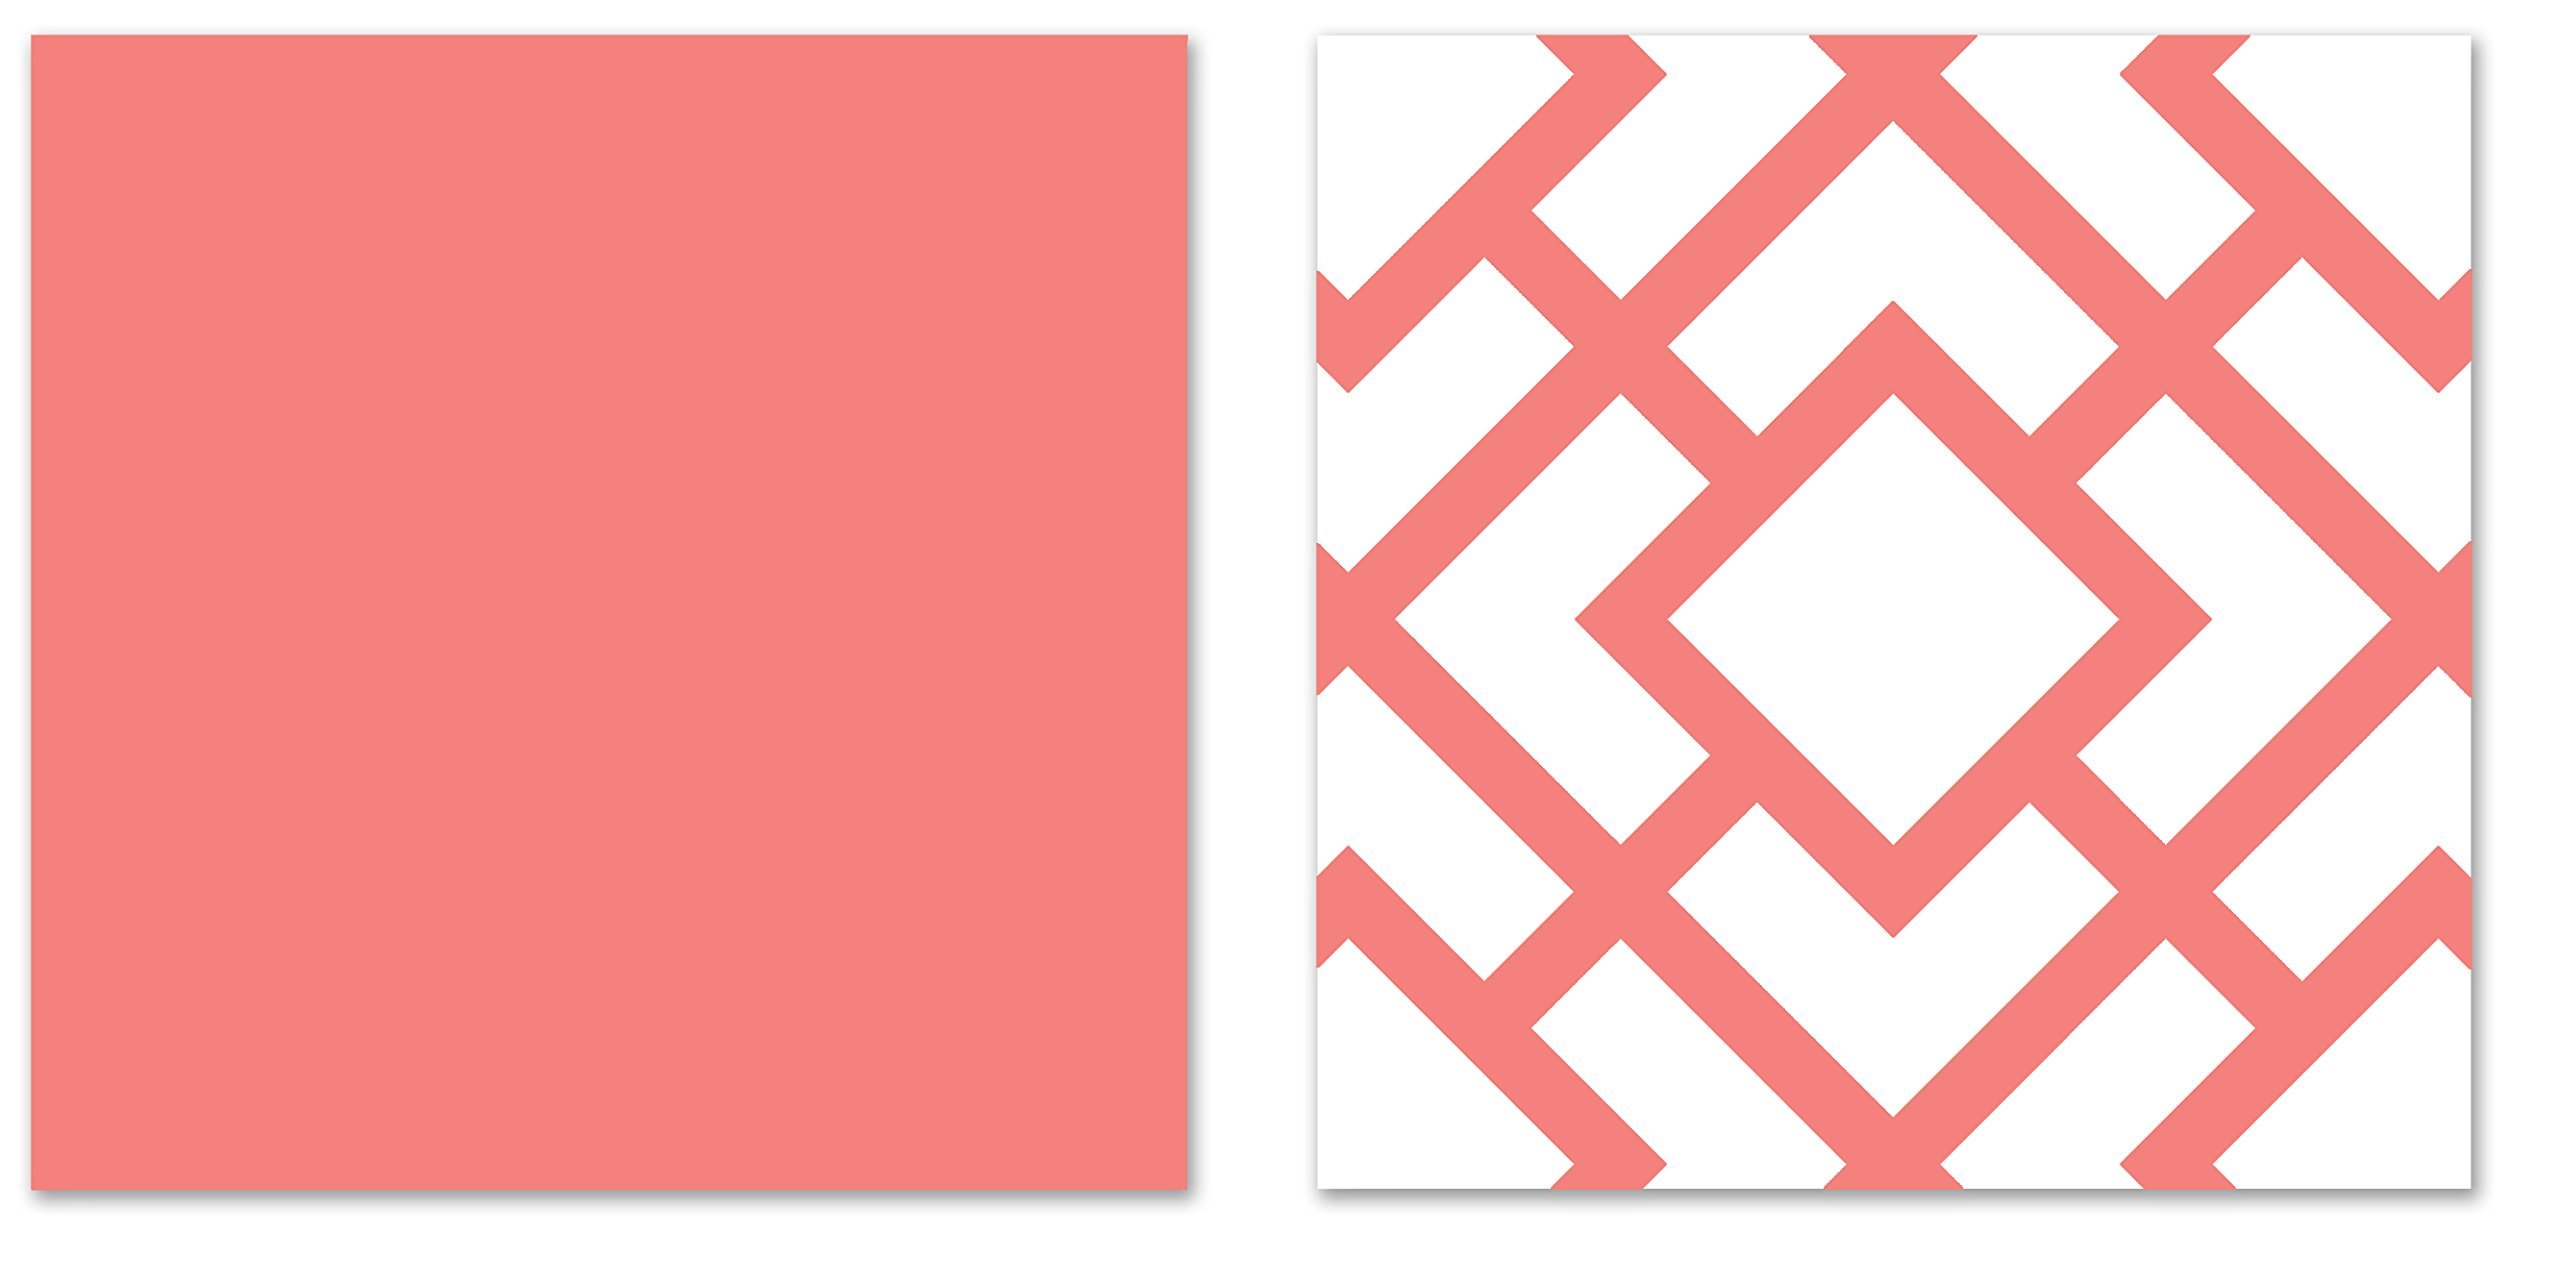 Sweet Jojo Designs Modern White and Coral Diamond Geometric Toddler Bed Bedding Girl Kids Childrens Comforter Sheet Set by Sweet Jojo Designs